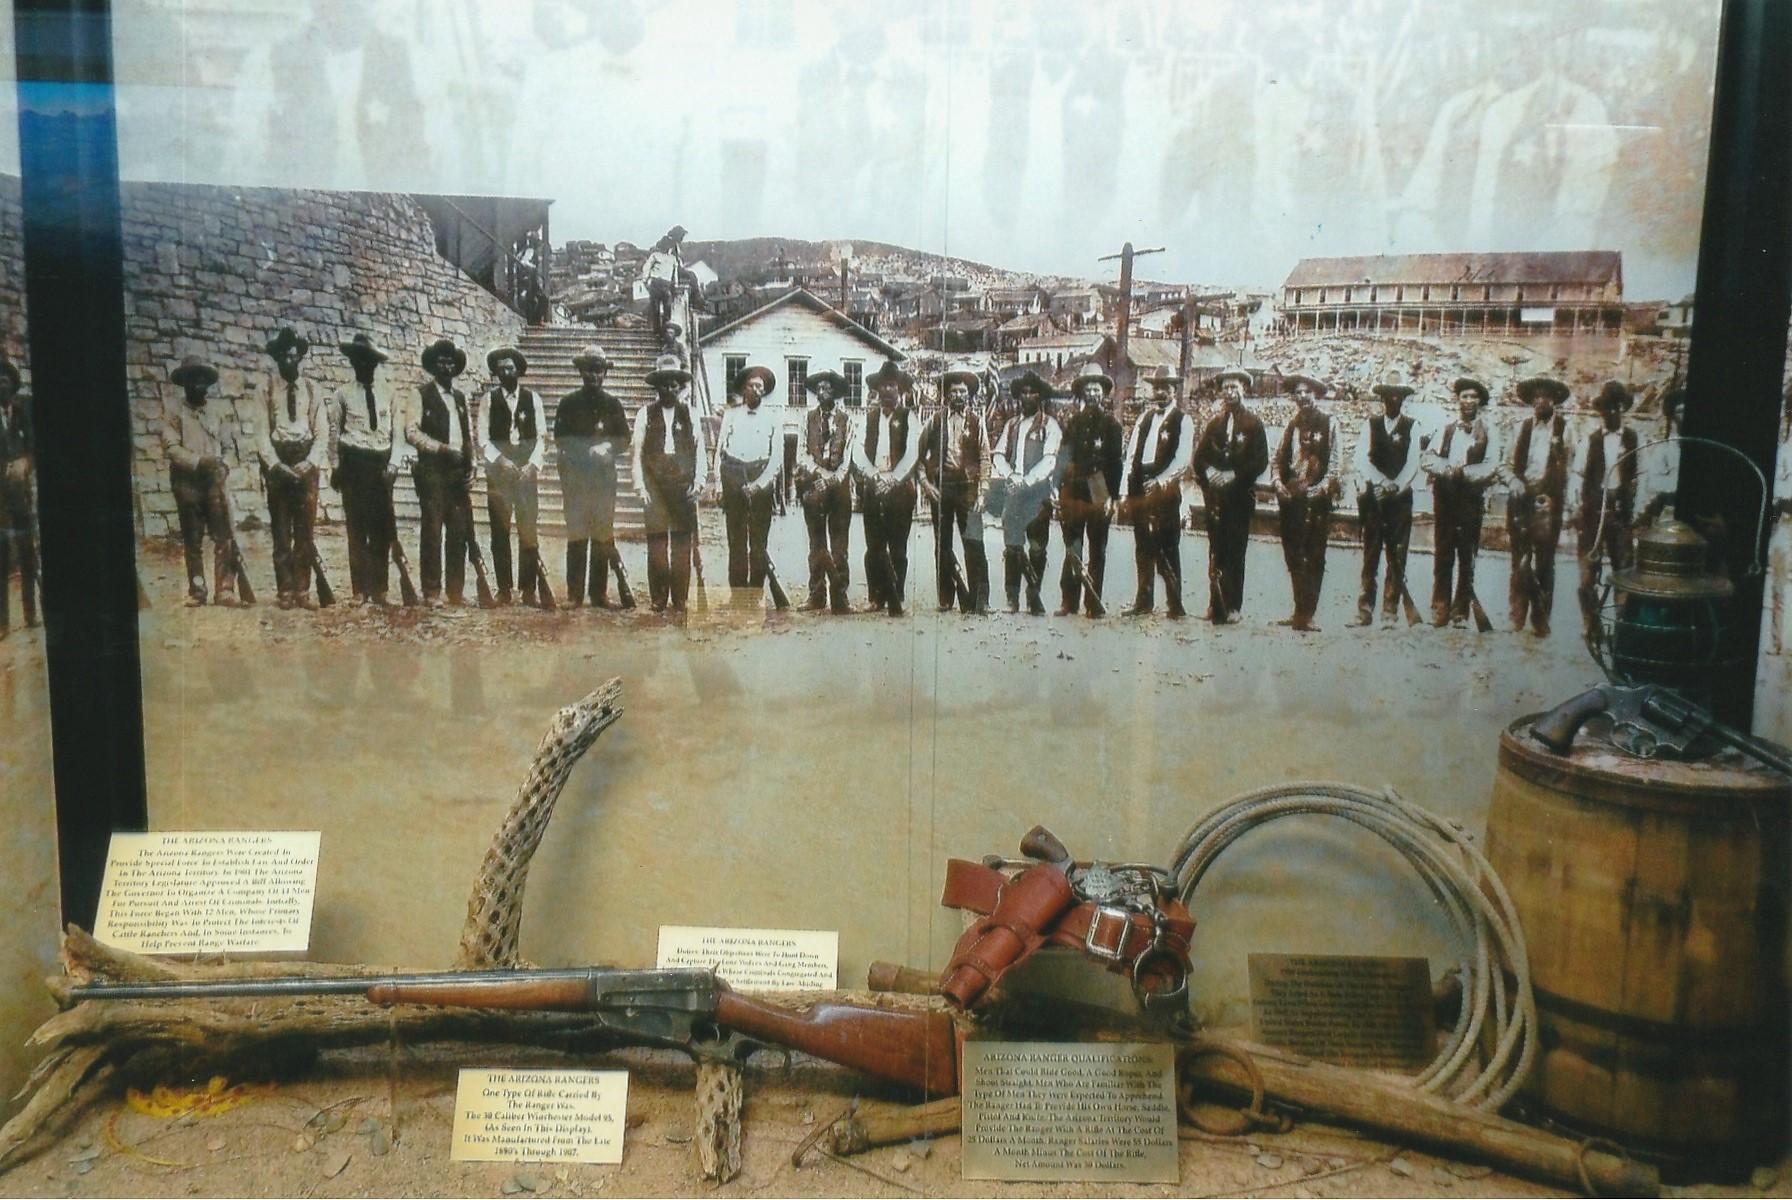 File:Phoenix-Phoenix Police Museum-exhibit-3 jpg - Wikimedia